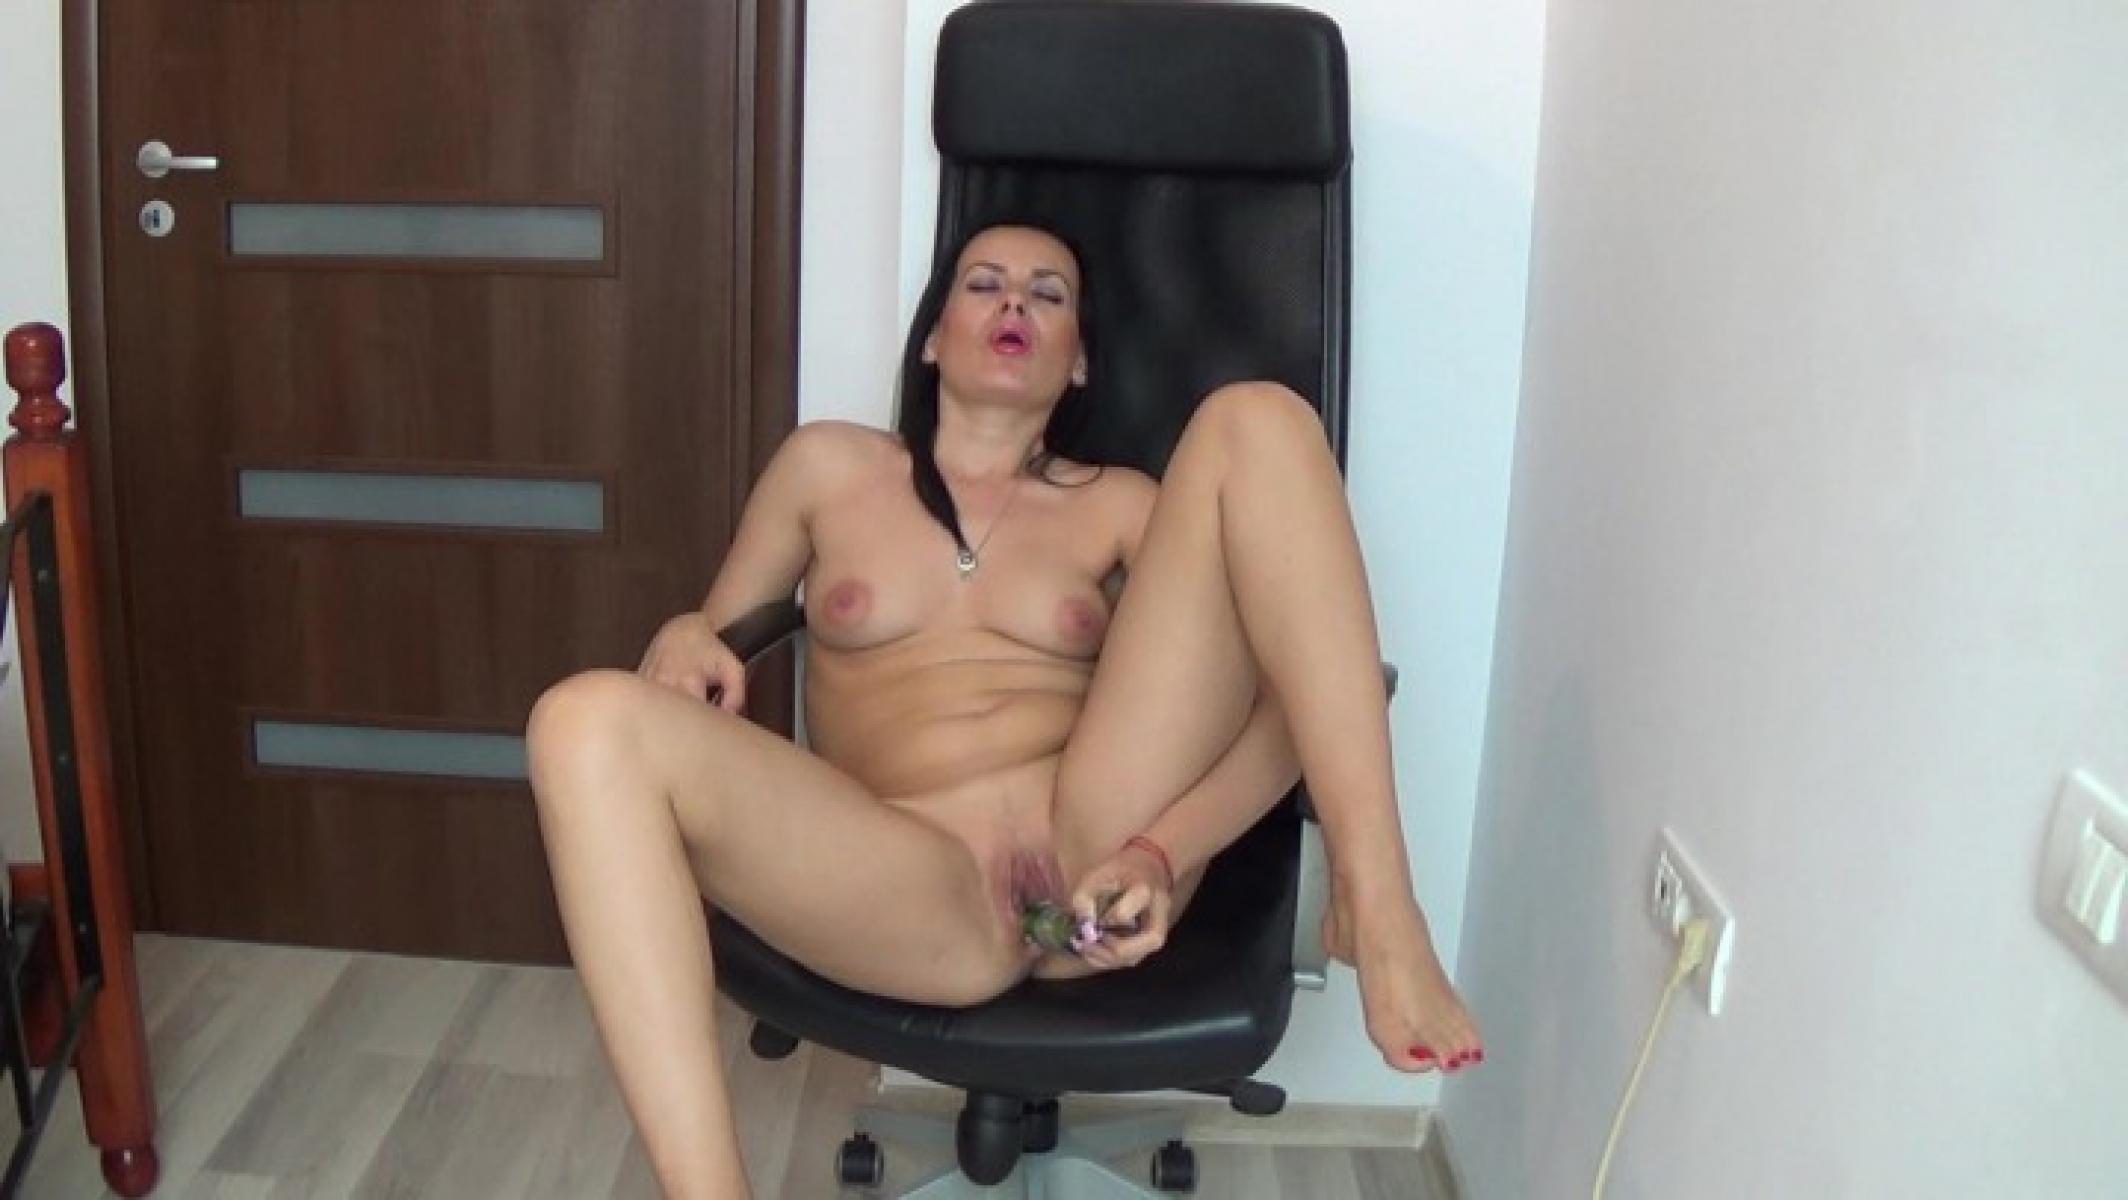 Black masturbate embarrassed nude